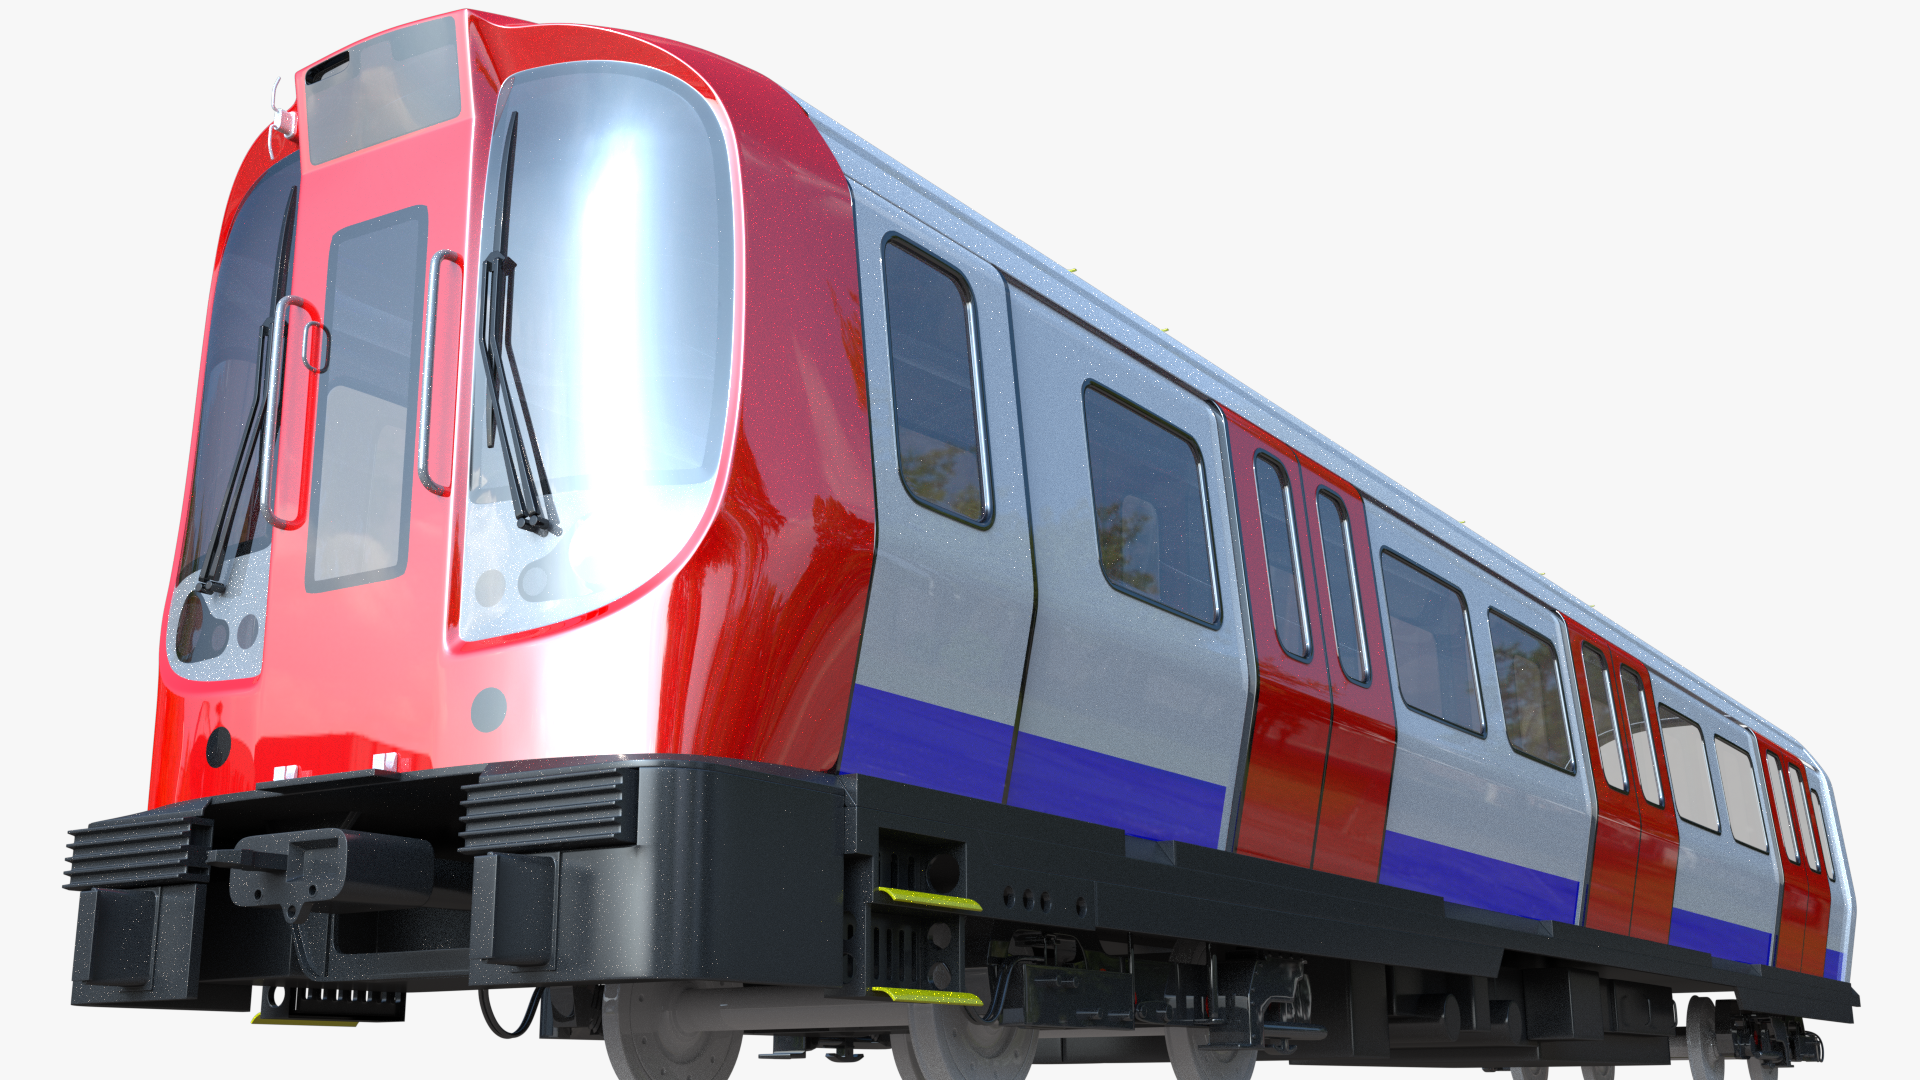 London Underground S8 3d Model London Underground Train London Underground Travel Oklahoma